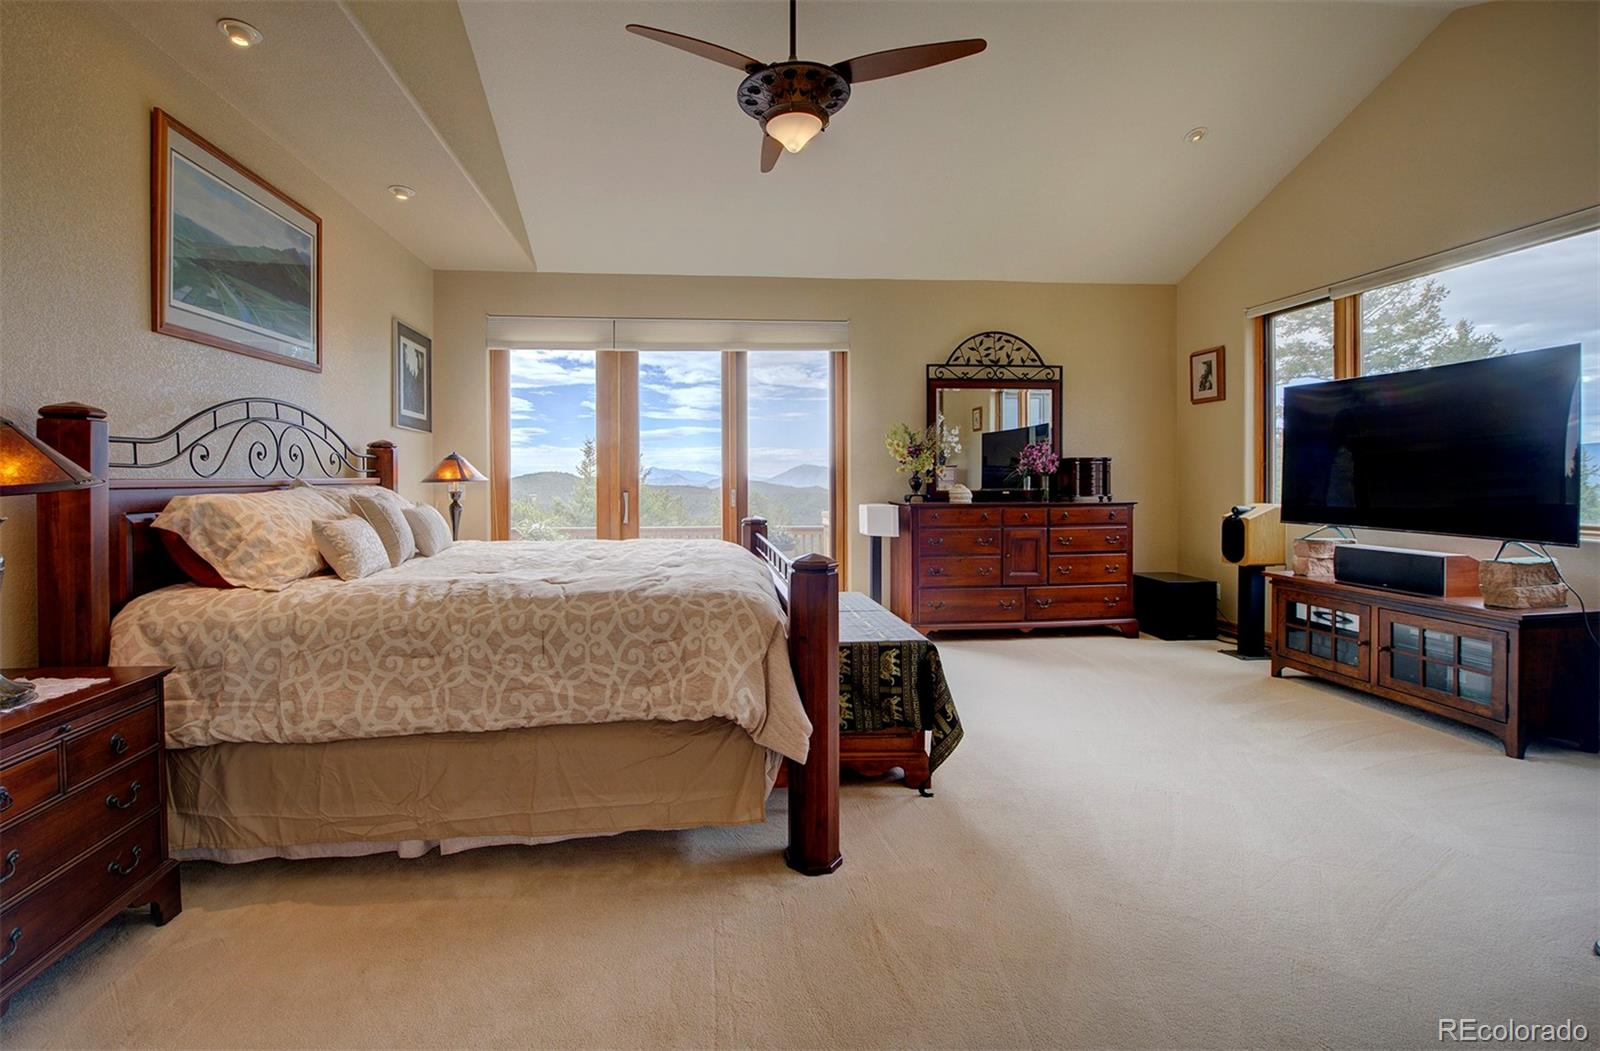 MLS# 9731389 - 16 - 28237 Belle Vista Drive, Conifer, CO 80433